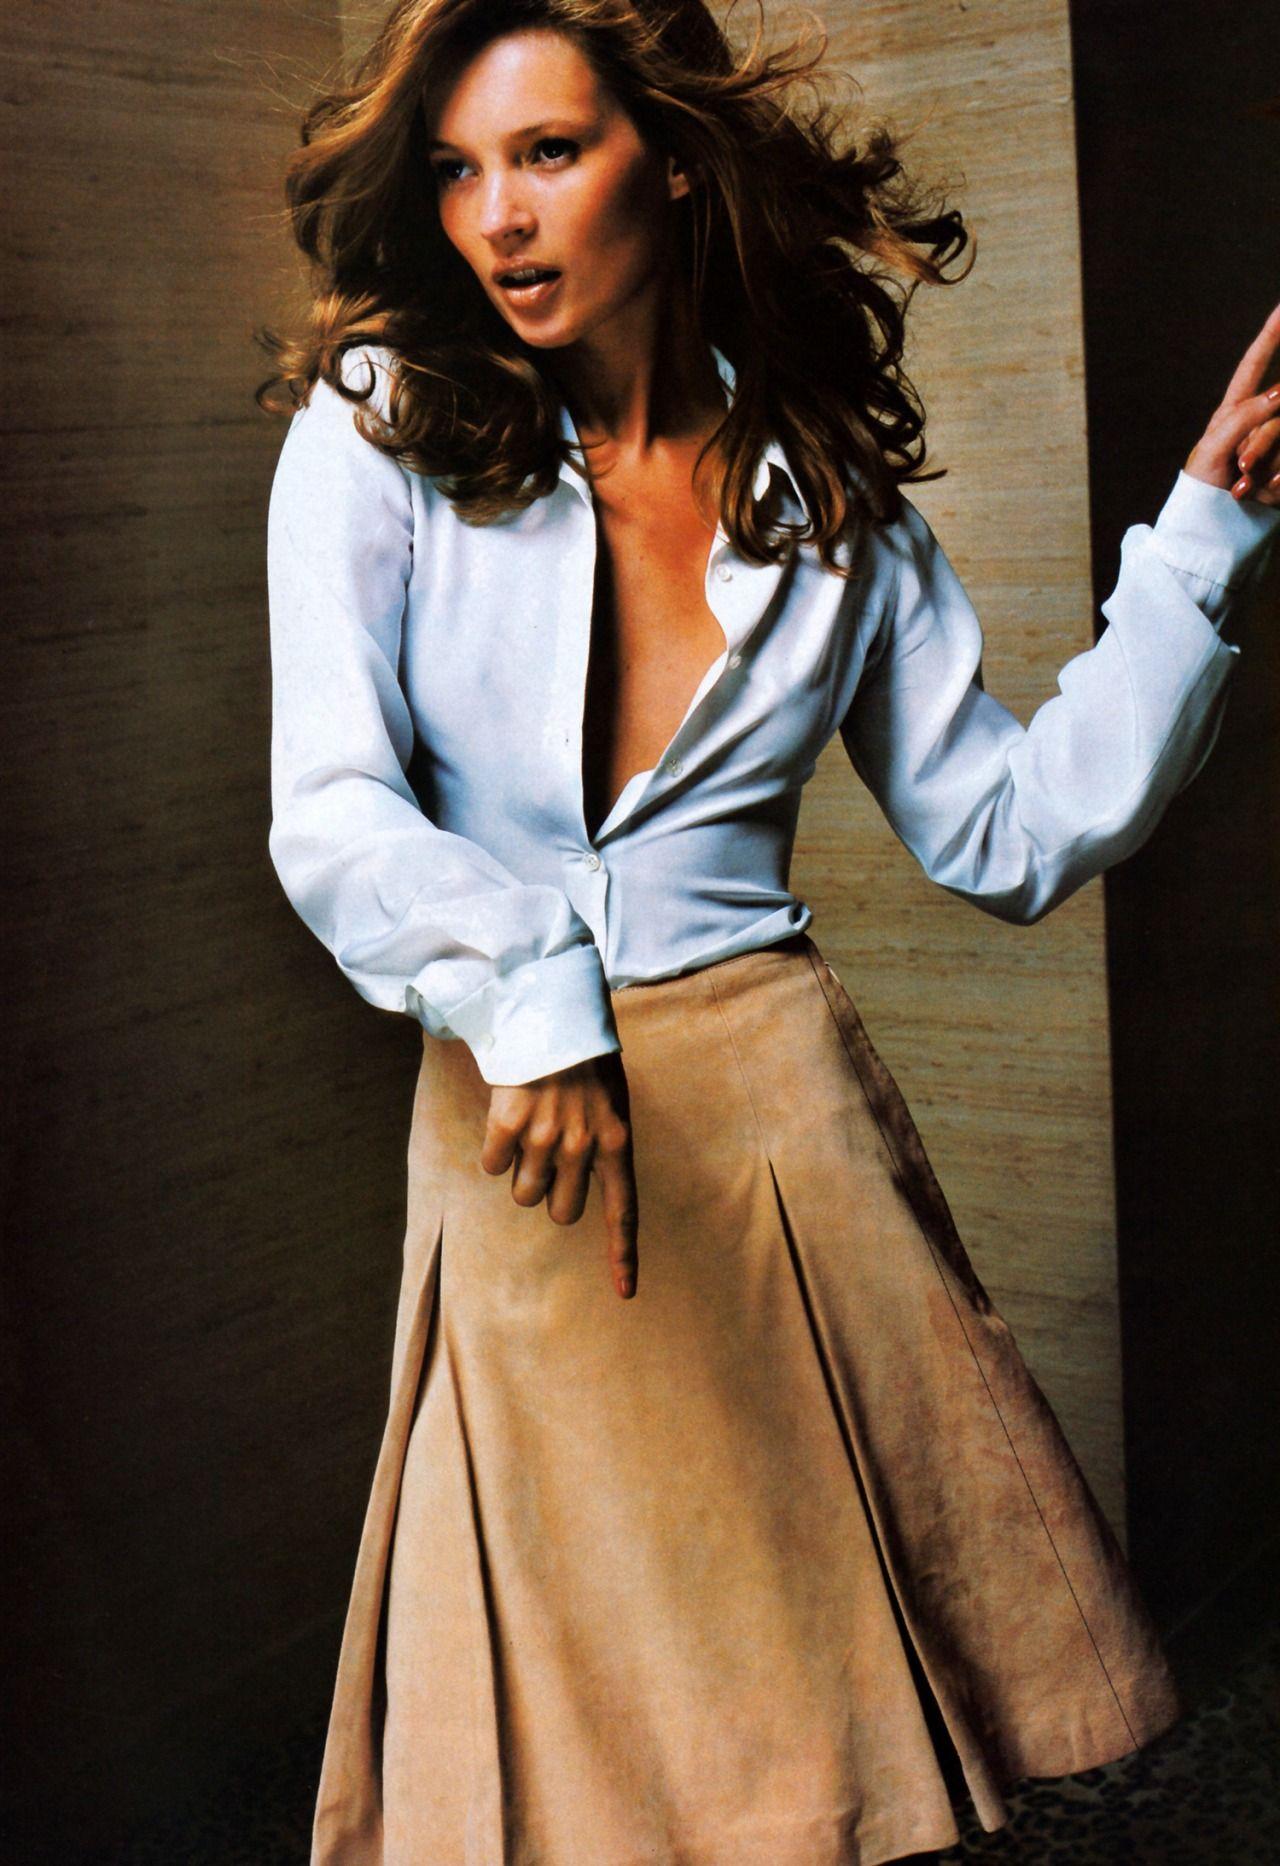 Kate Moss wearing Celine, photo Mario Testino for American Vogue November 1996.